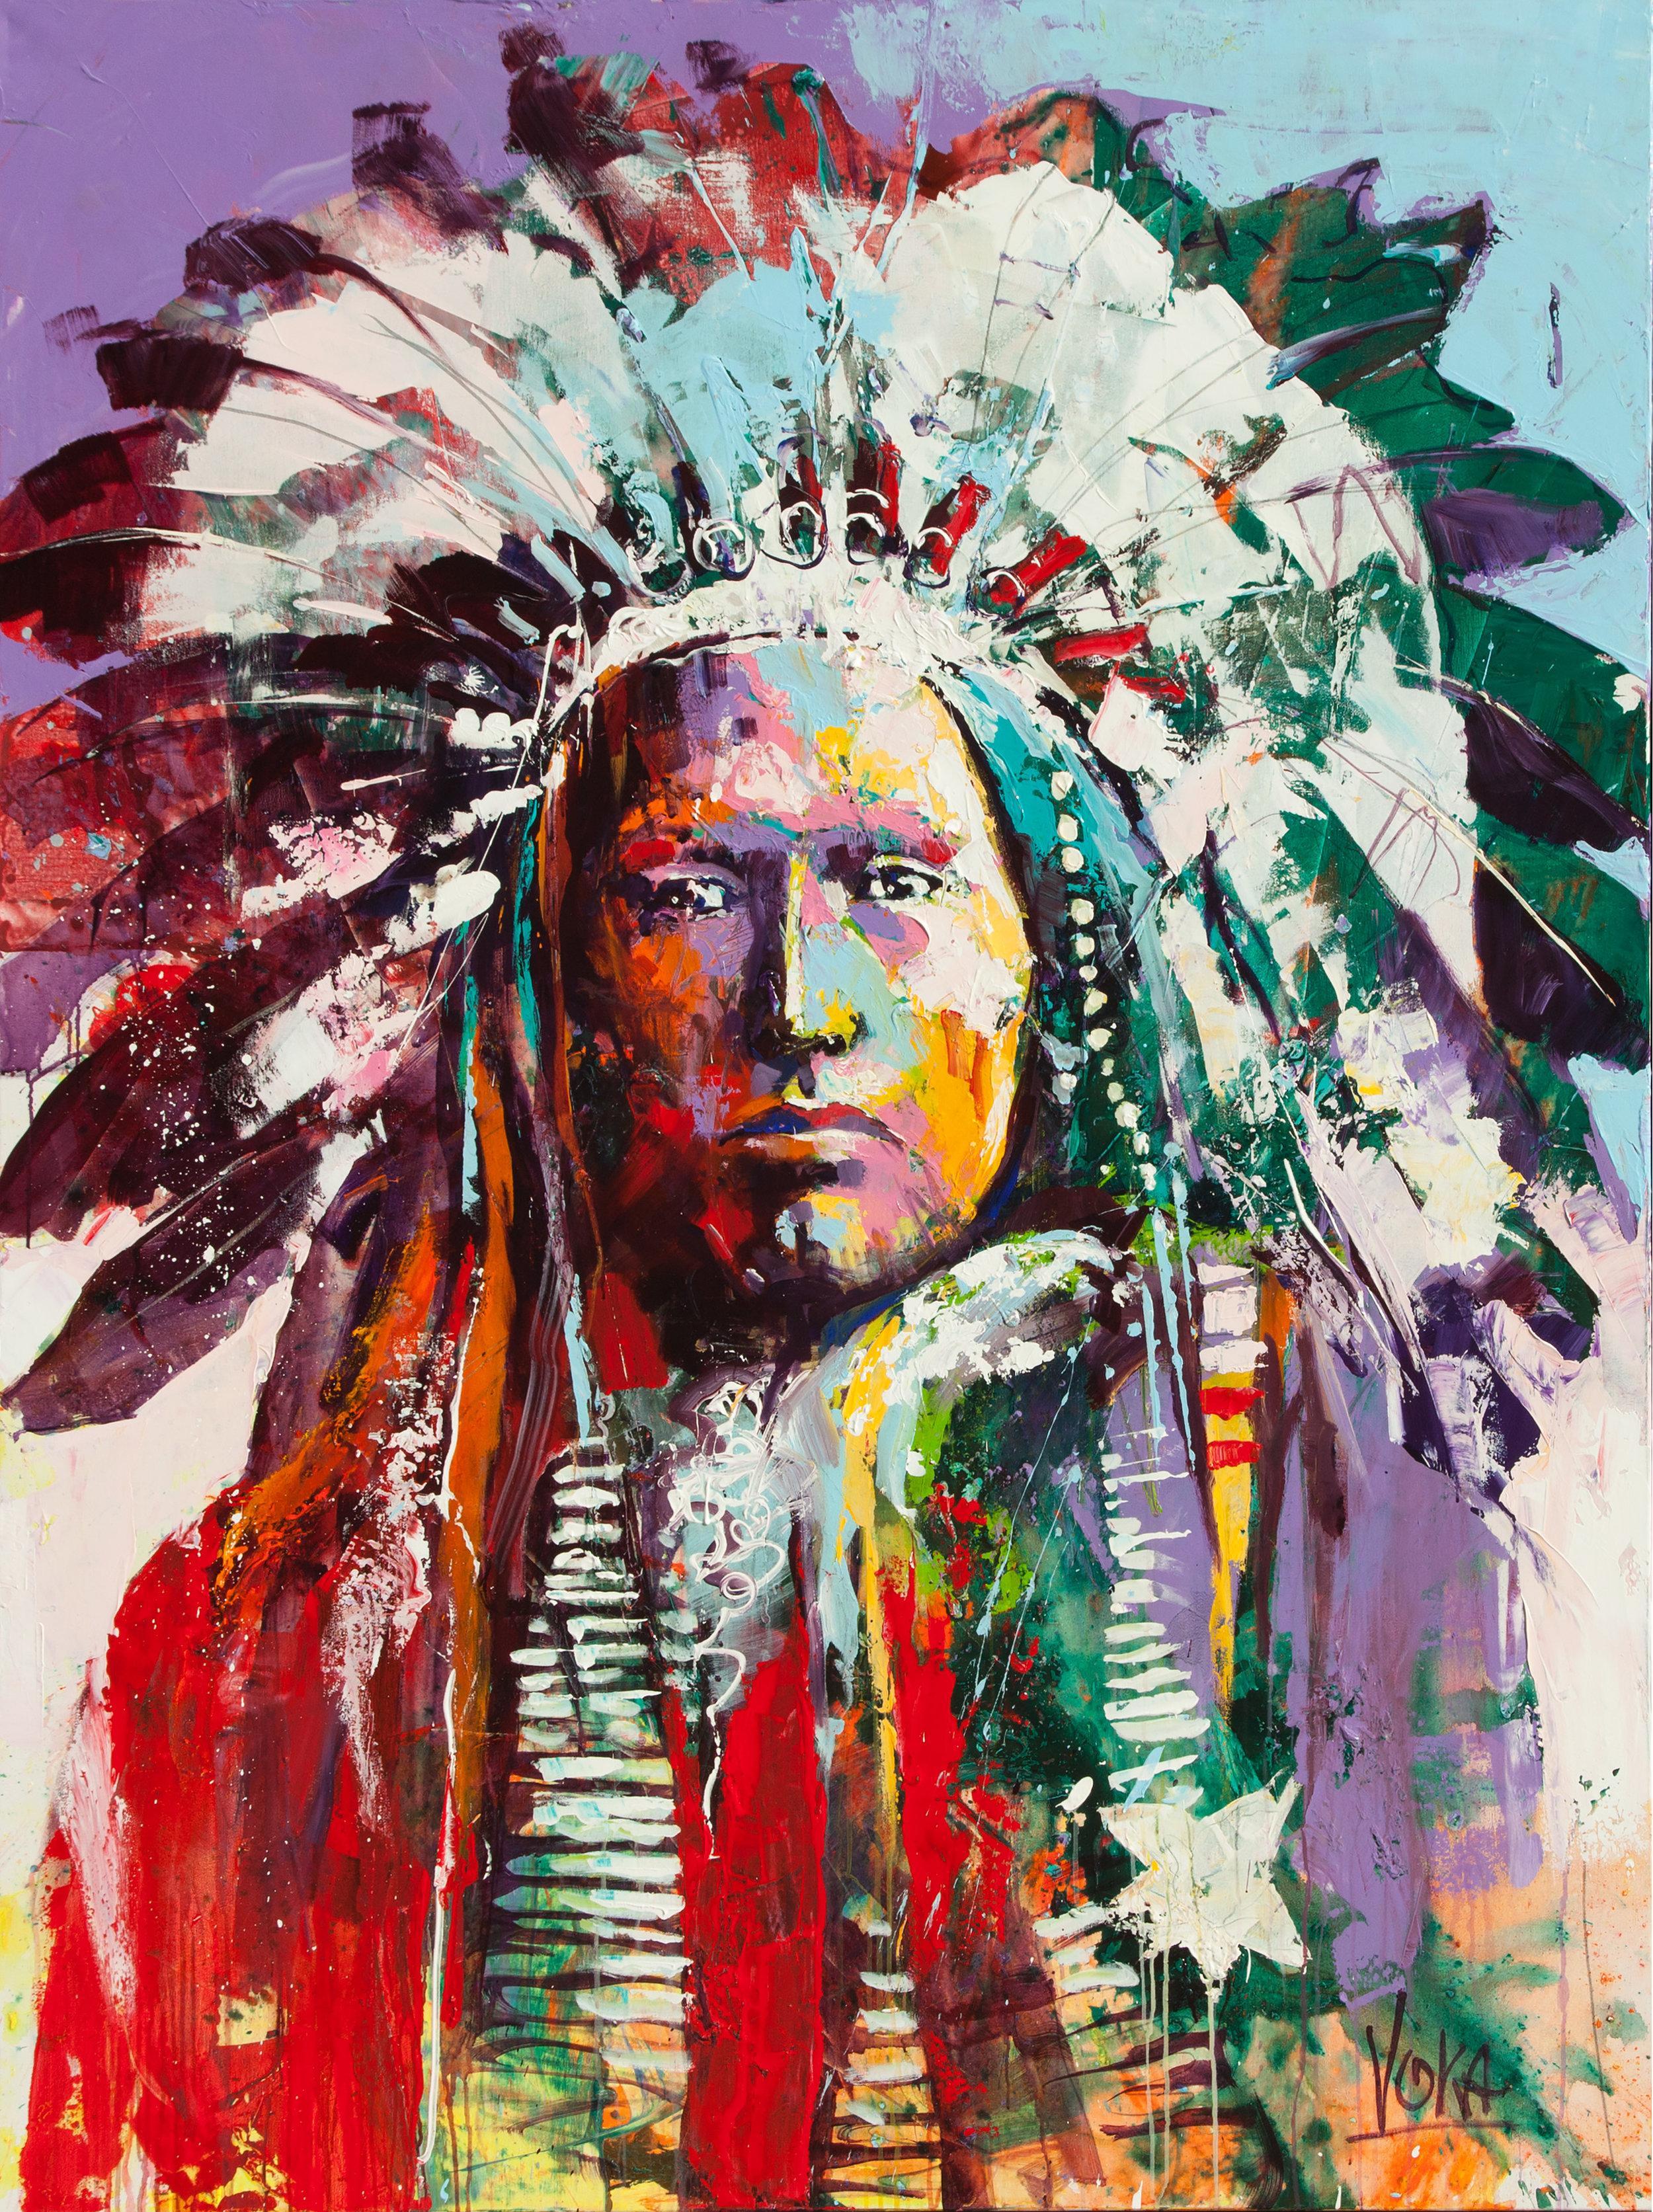 Native American Chief, 200x150 cm/78,7x59,1 inch, Acrylic on Canvas